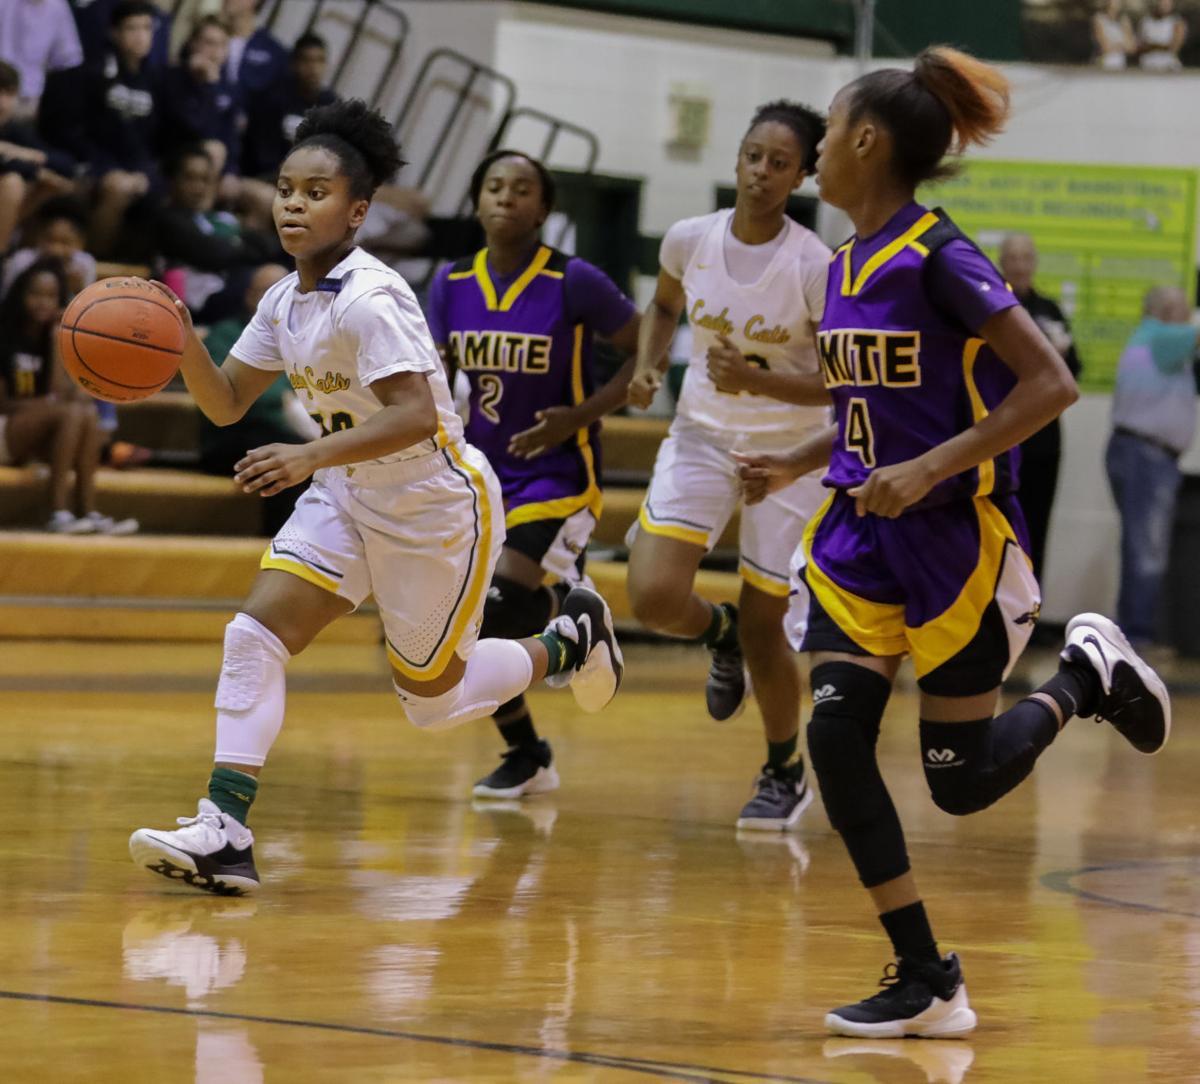 Walker Basketball Jamboree Asia Garner